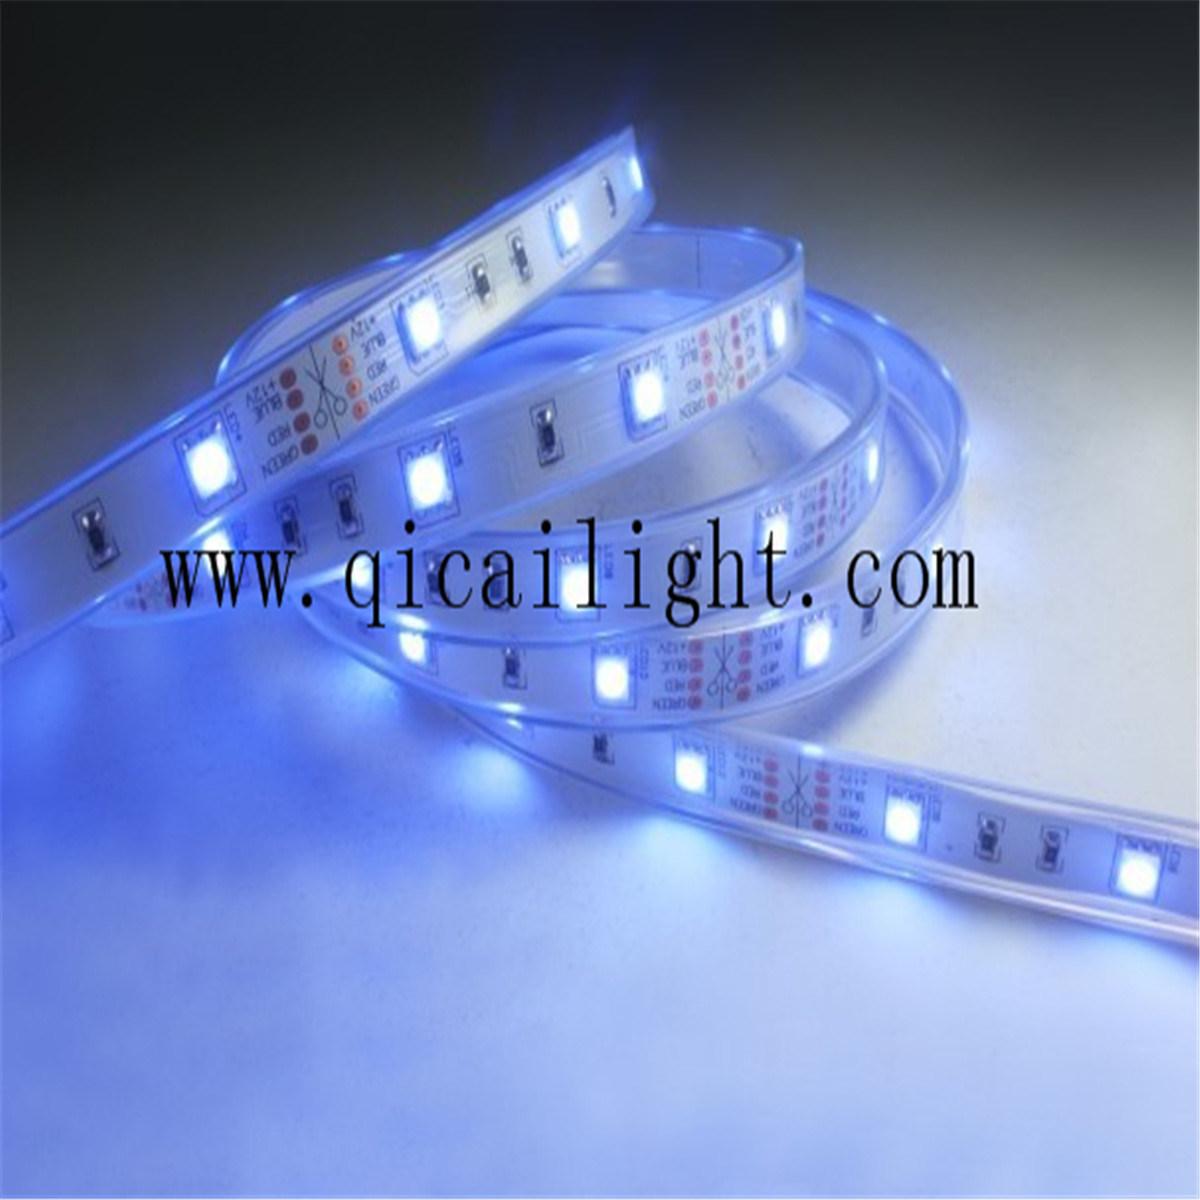 Superbright 5050 LED Light Tape, 5050 Strip Light